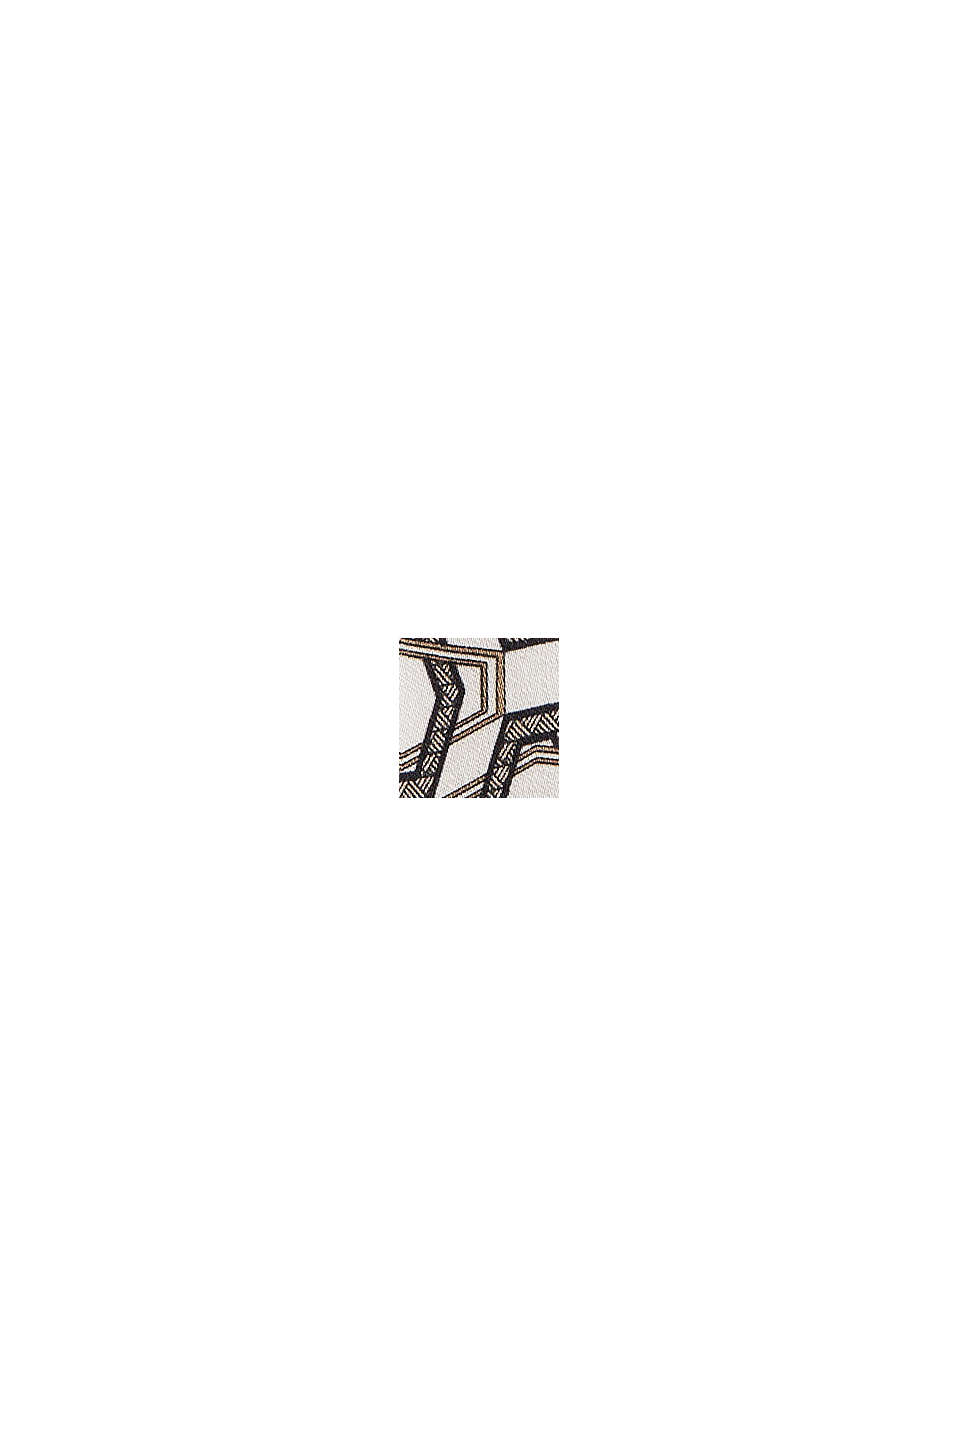 Bluse mit Minimal-Print, LENZING™ ECOVERO™, OFF WHITE, swatch